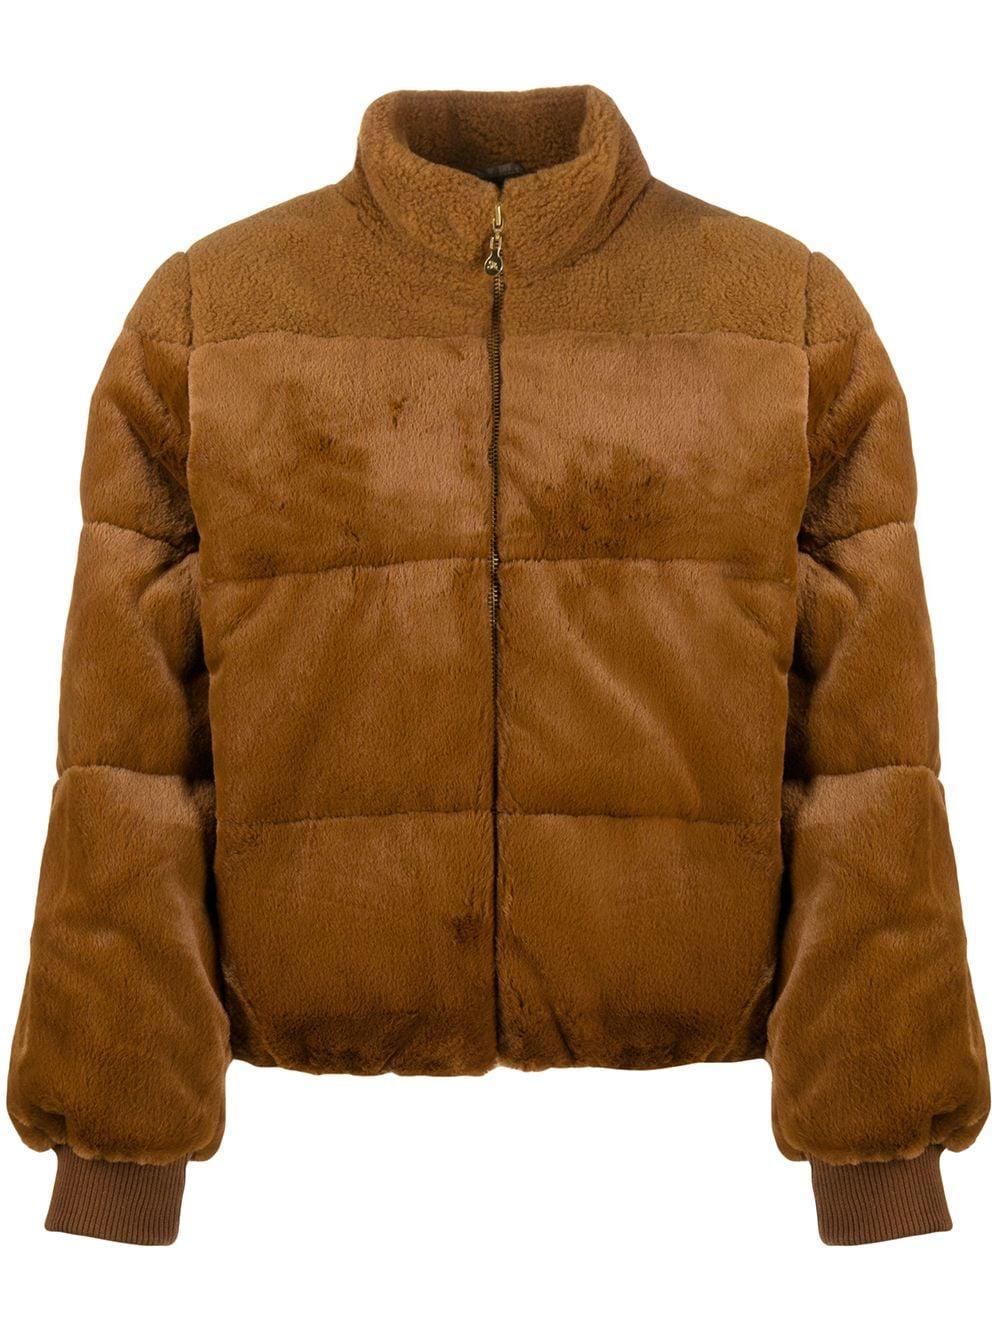 Aria Faux Fur Outerwear Coat Item # SG2660